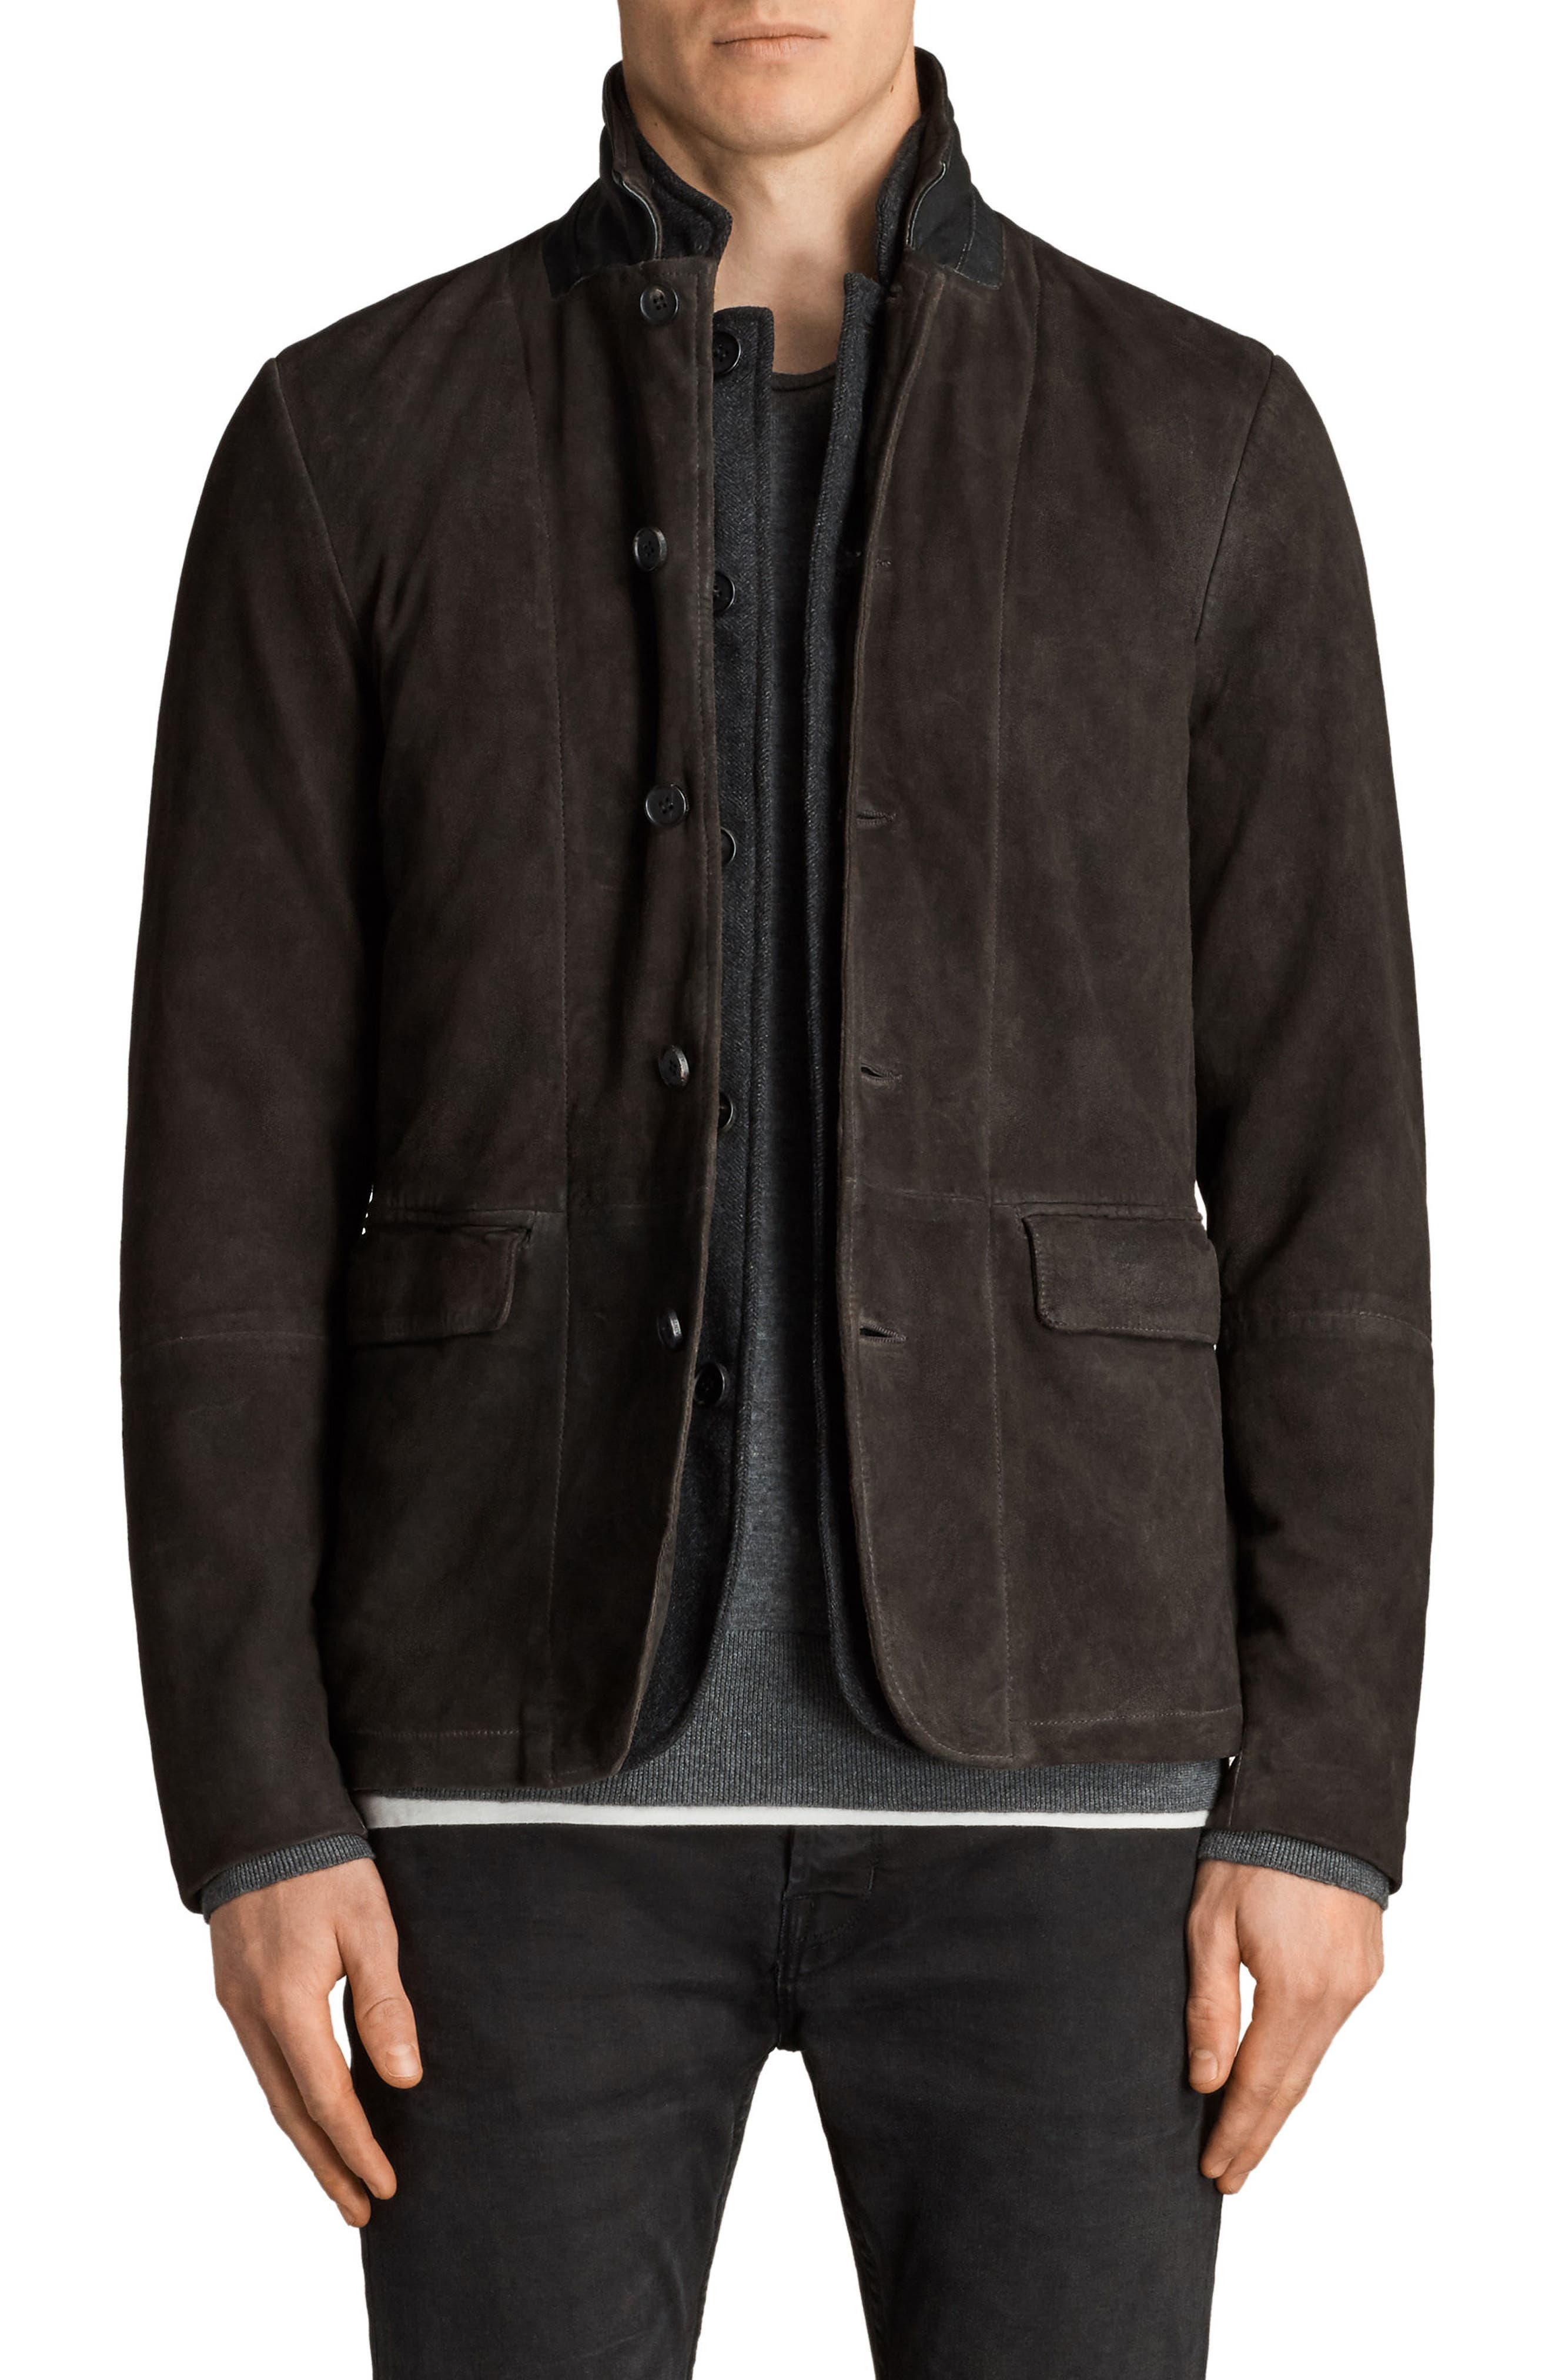 Survey Leather Blazer,                             Main thumbnail 1, color,                             Anthracite Grey